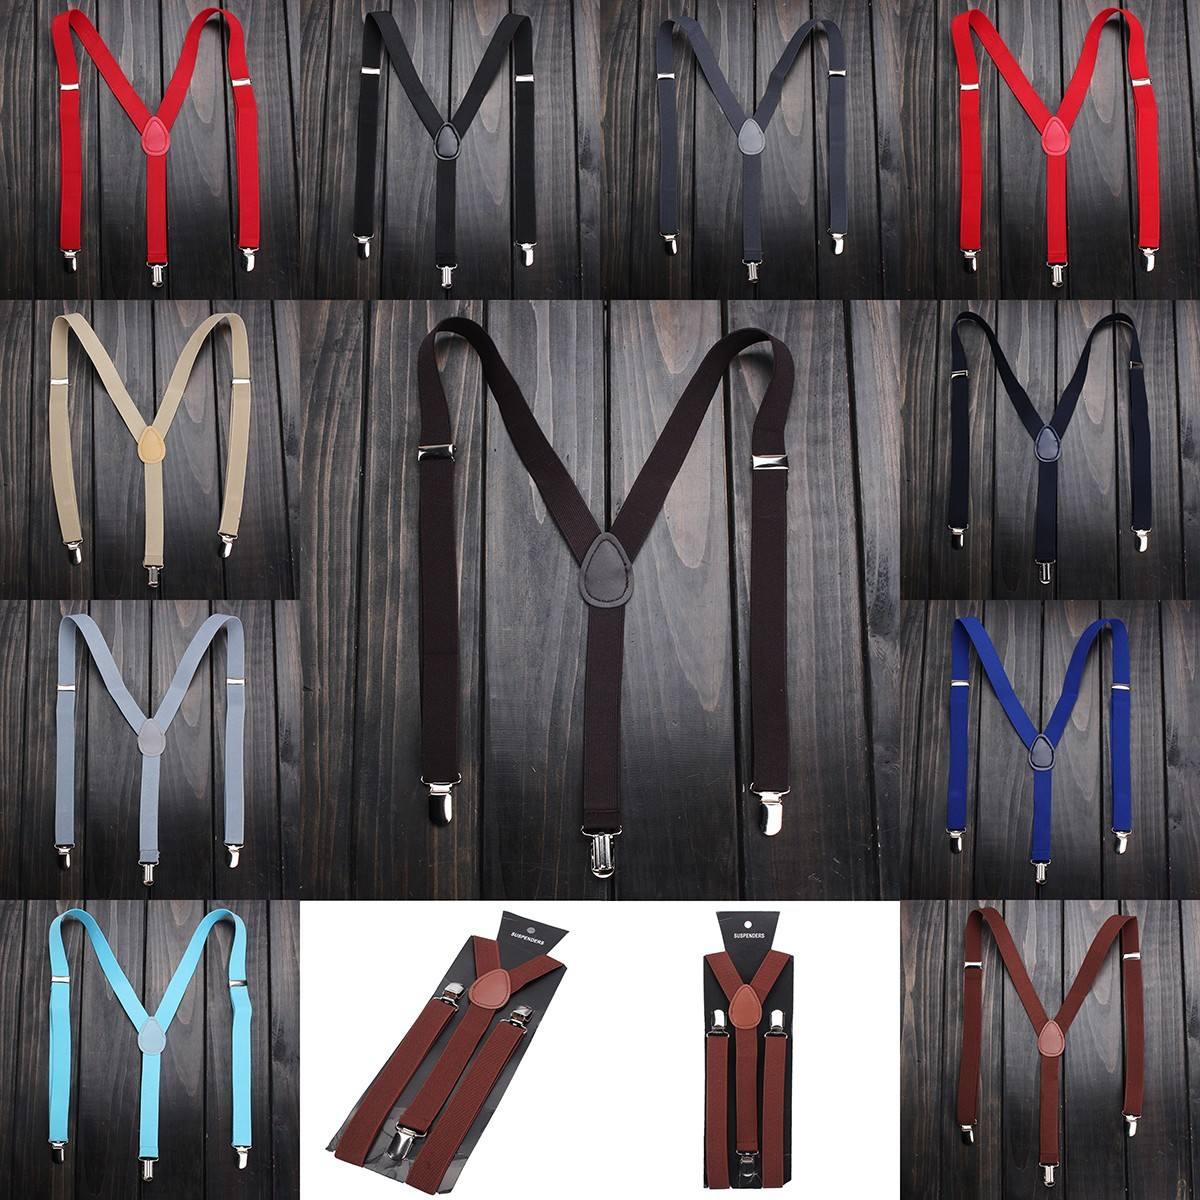 Fashion Adjustable Elastic Adult Suspender Straps Y Shape Clip-on Men's Suspenders 3 Clip Pants Braces For Women Belt Straps